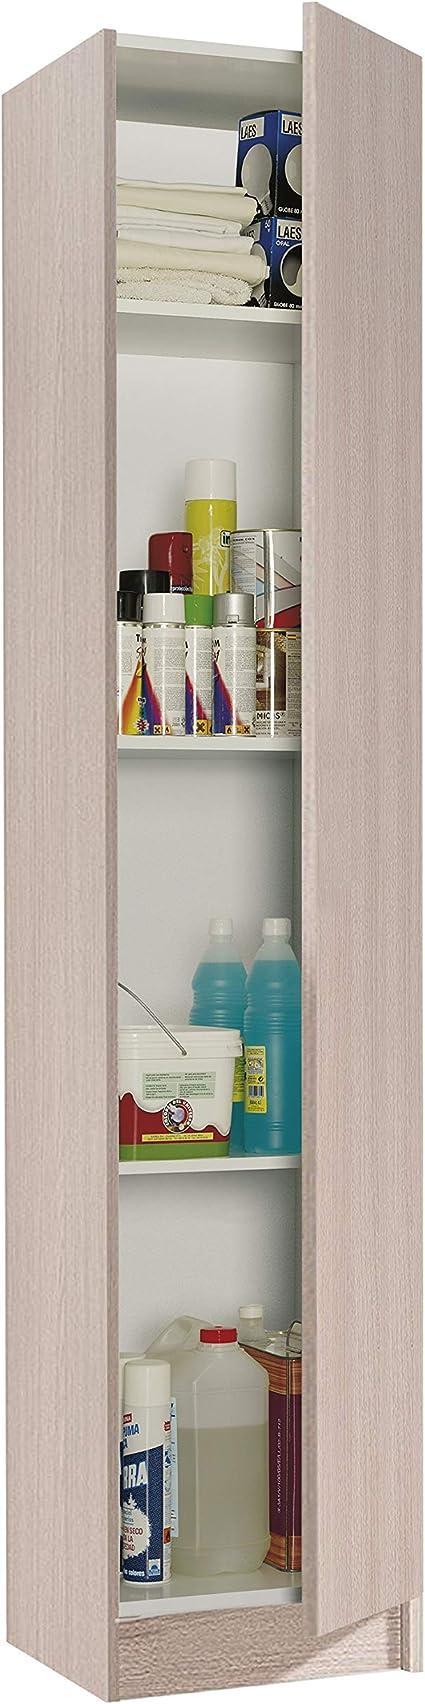 Oferta amazon: Habitdesign Armario Multiusos, 1 Puerta, Columna, Acabado en Color Roble, Medidas: 37 cm (Ancho) x 182 cm (Alto) x 37 cm (Fondo)